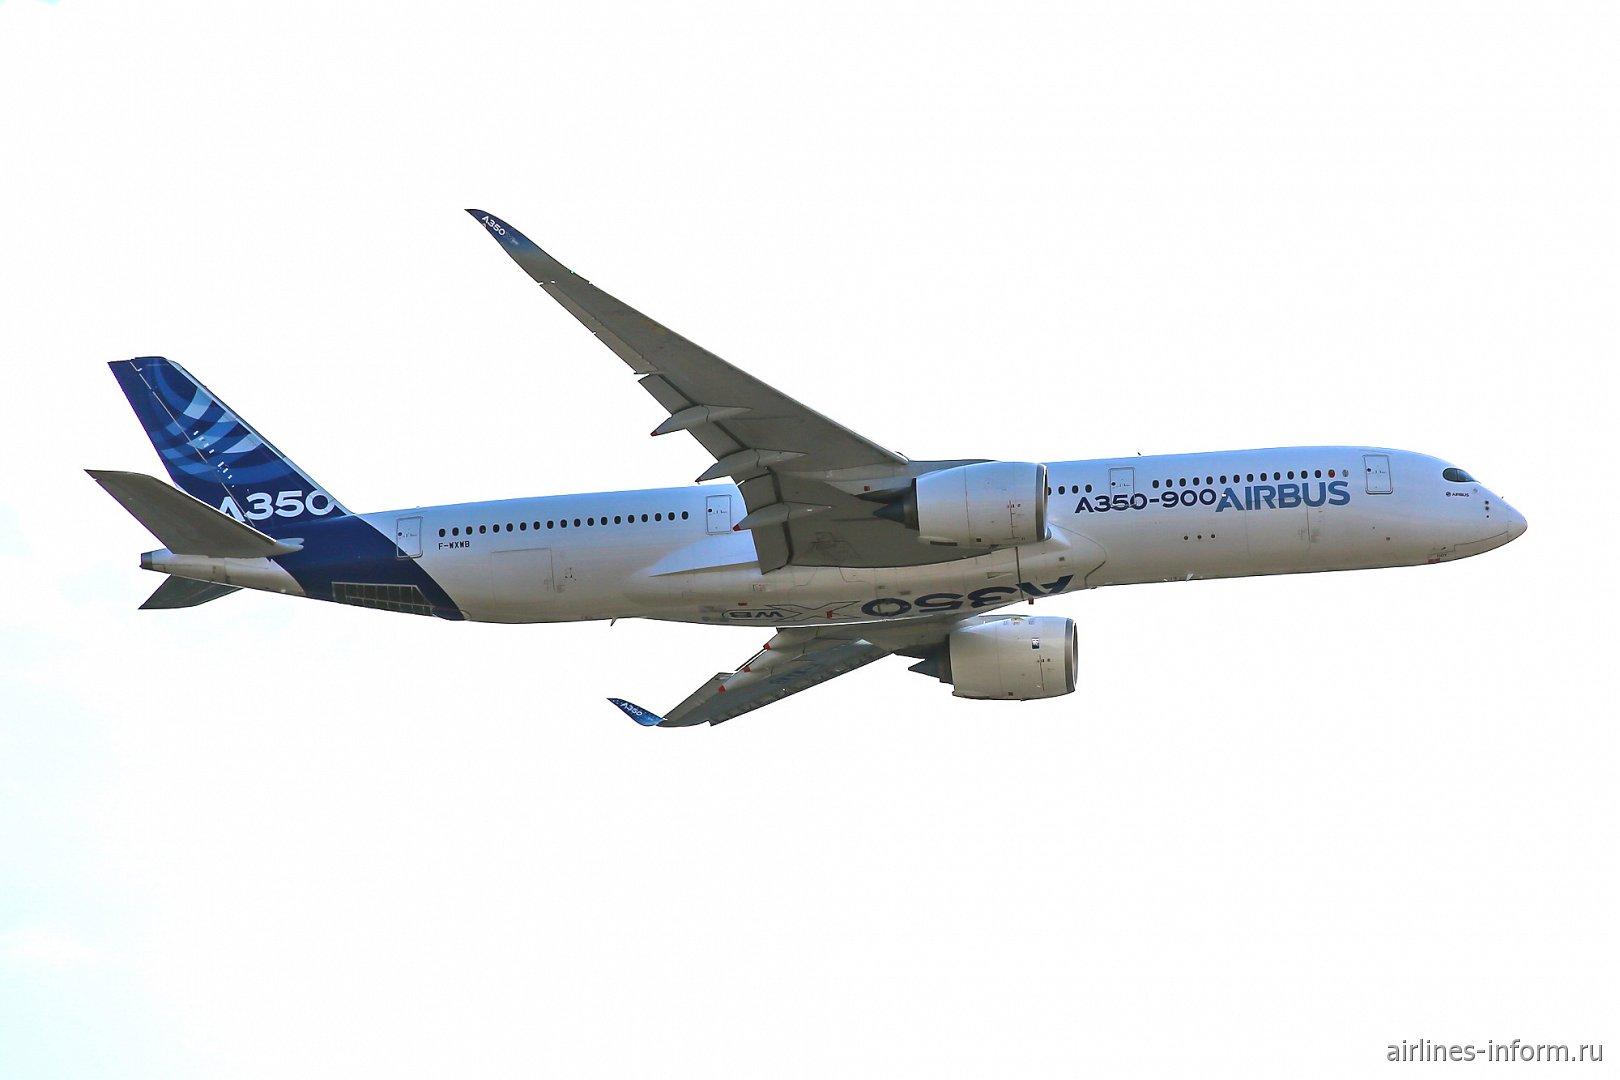 Самолет Airbus A350XWB в полете на авиасалоне МАКС-2015